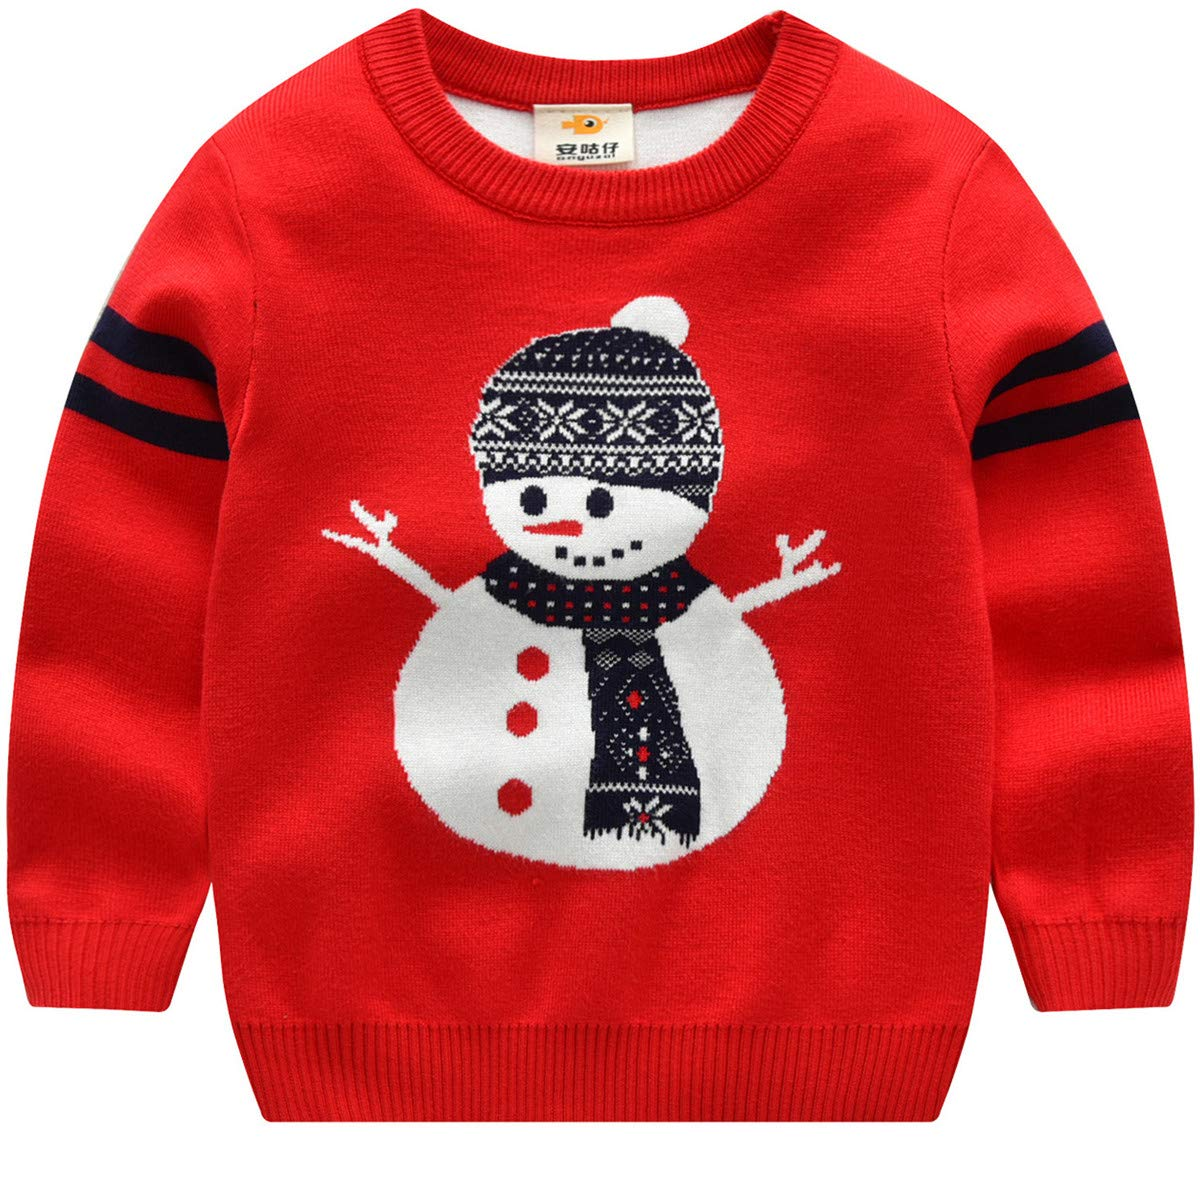 JELEUON Baby Boys Girls Toddler Long Sleeve Christmas Deer Snowman Pullover Sweater Sweatshirt